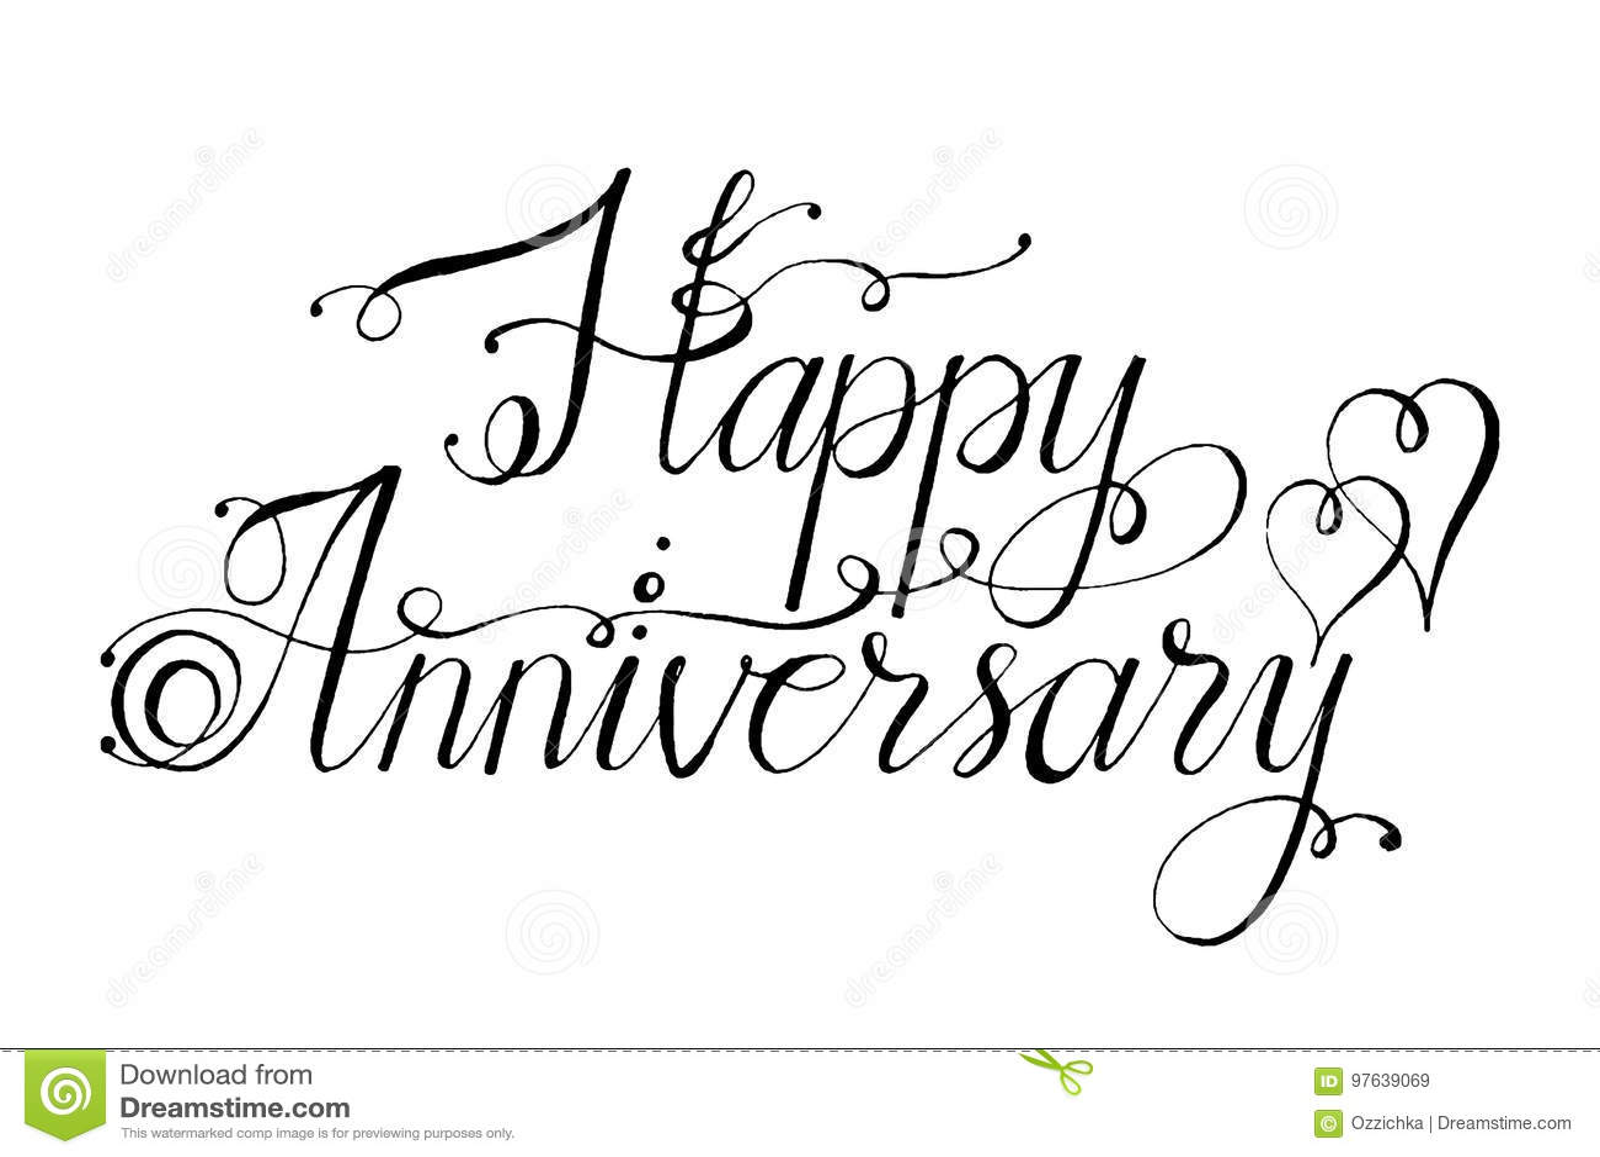 anniversary clipart